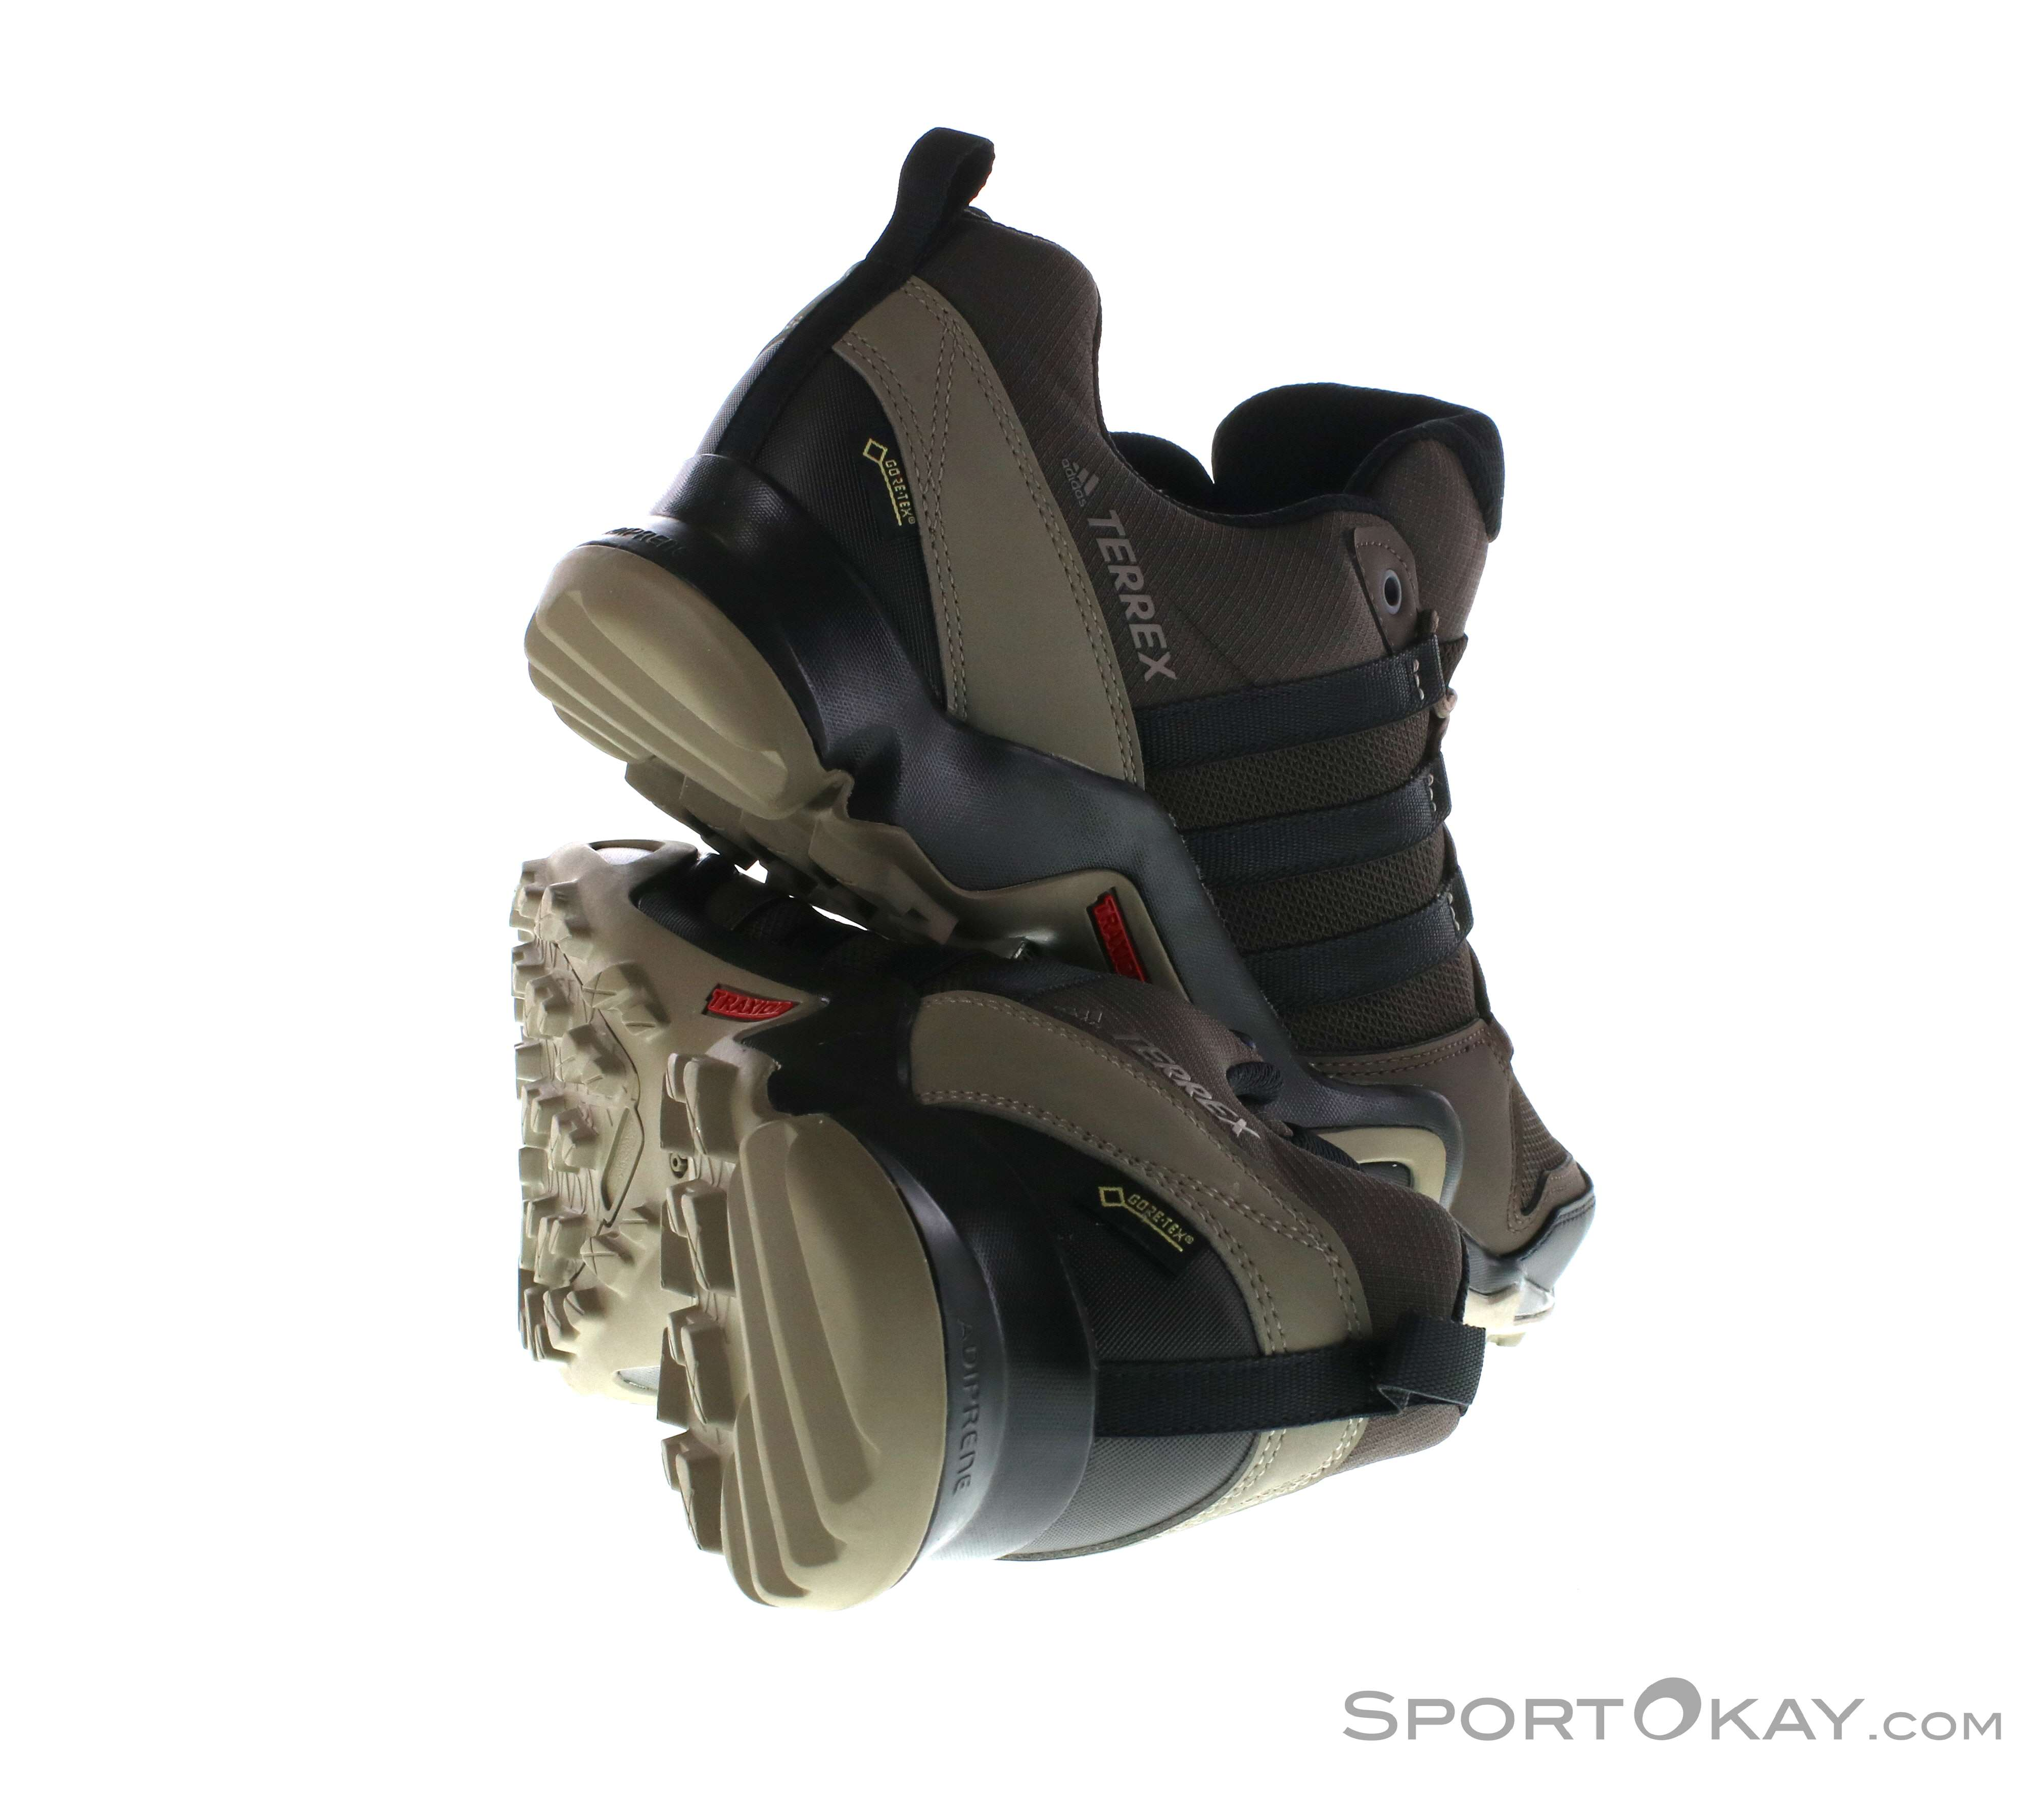 adidas Terrex AX2R GTX Mens Trekking Shoes Gore-Tex - Trekking Shoes ... 1d3dbaf572a